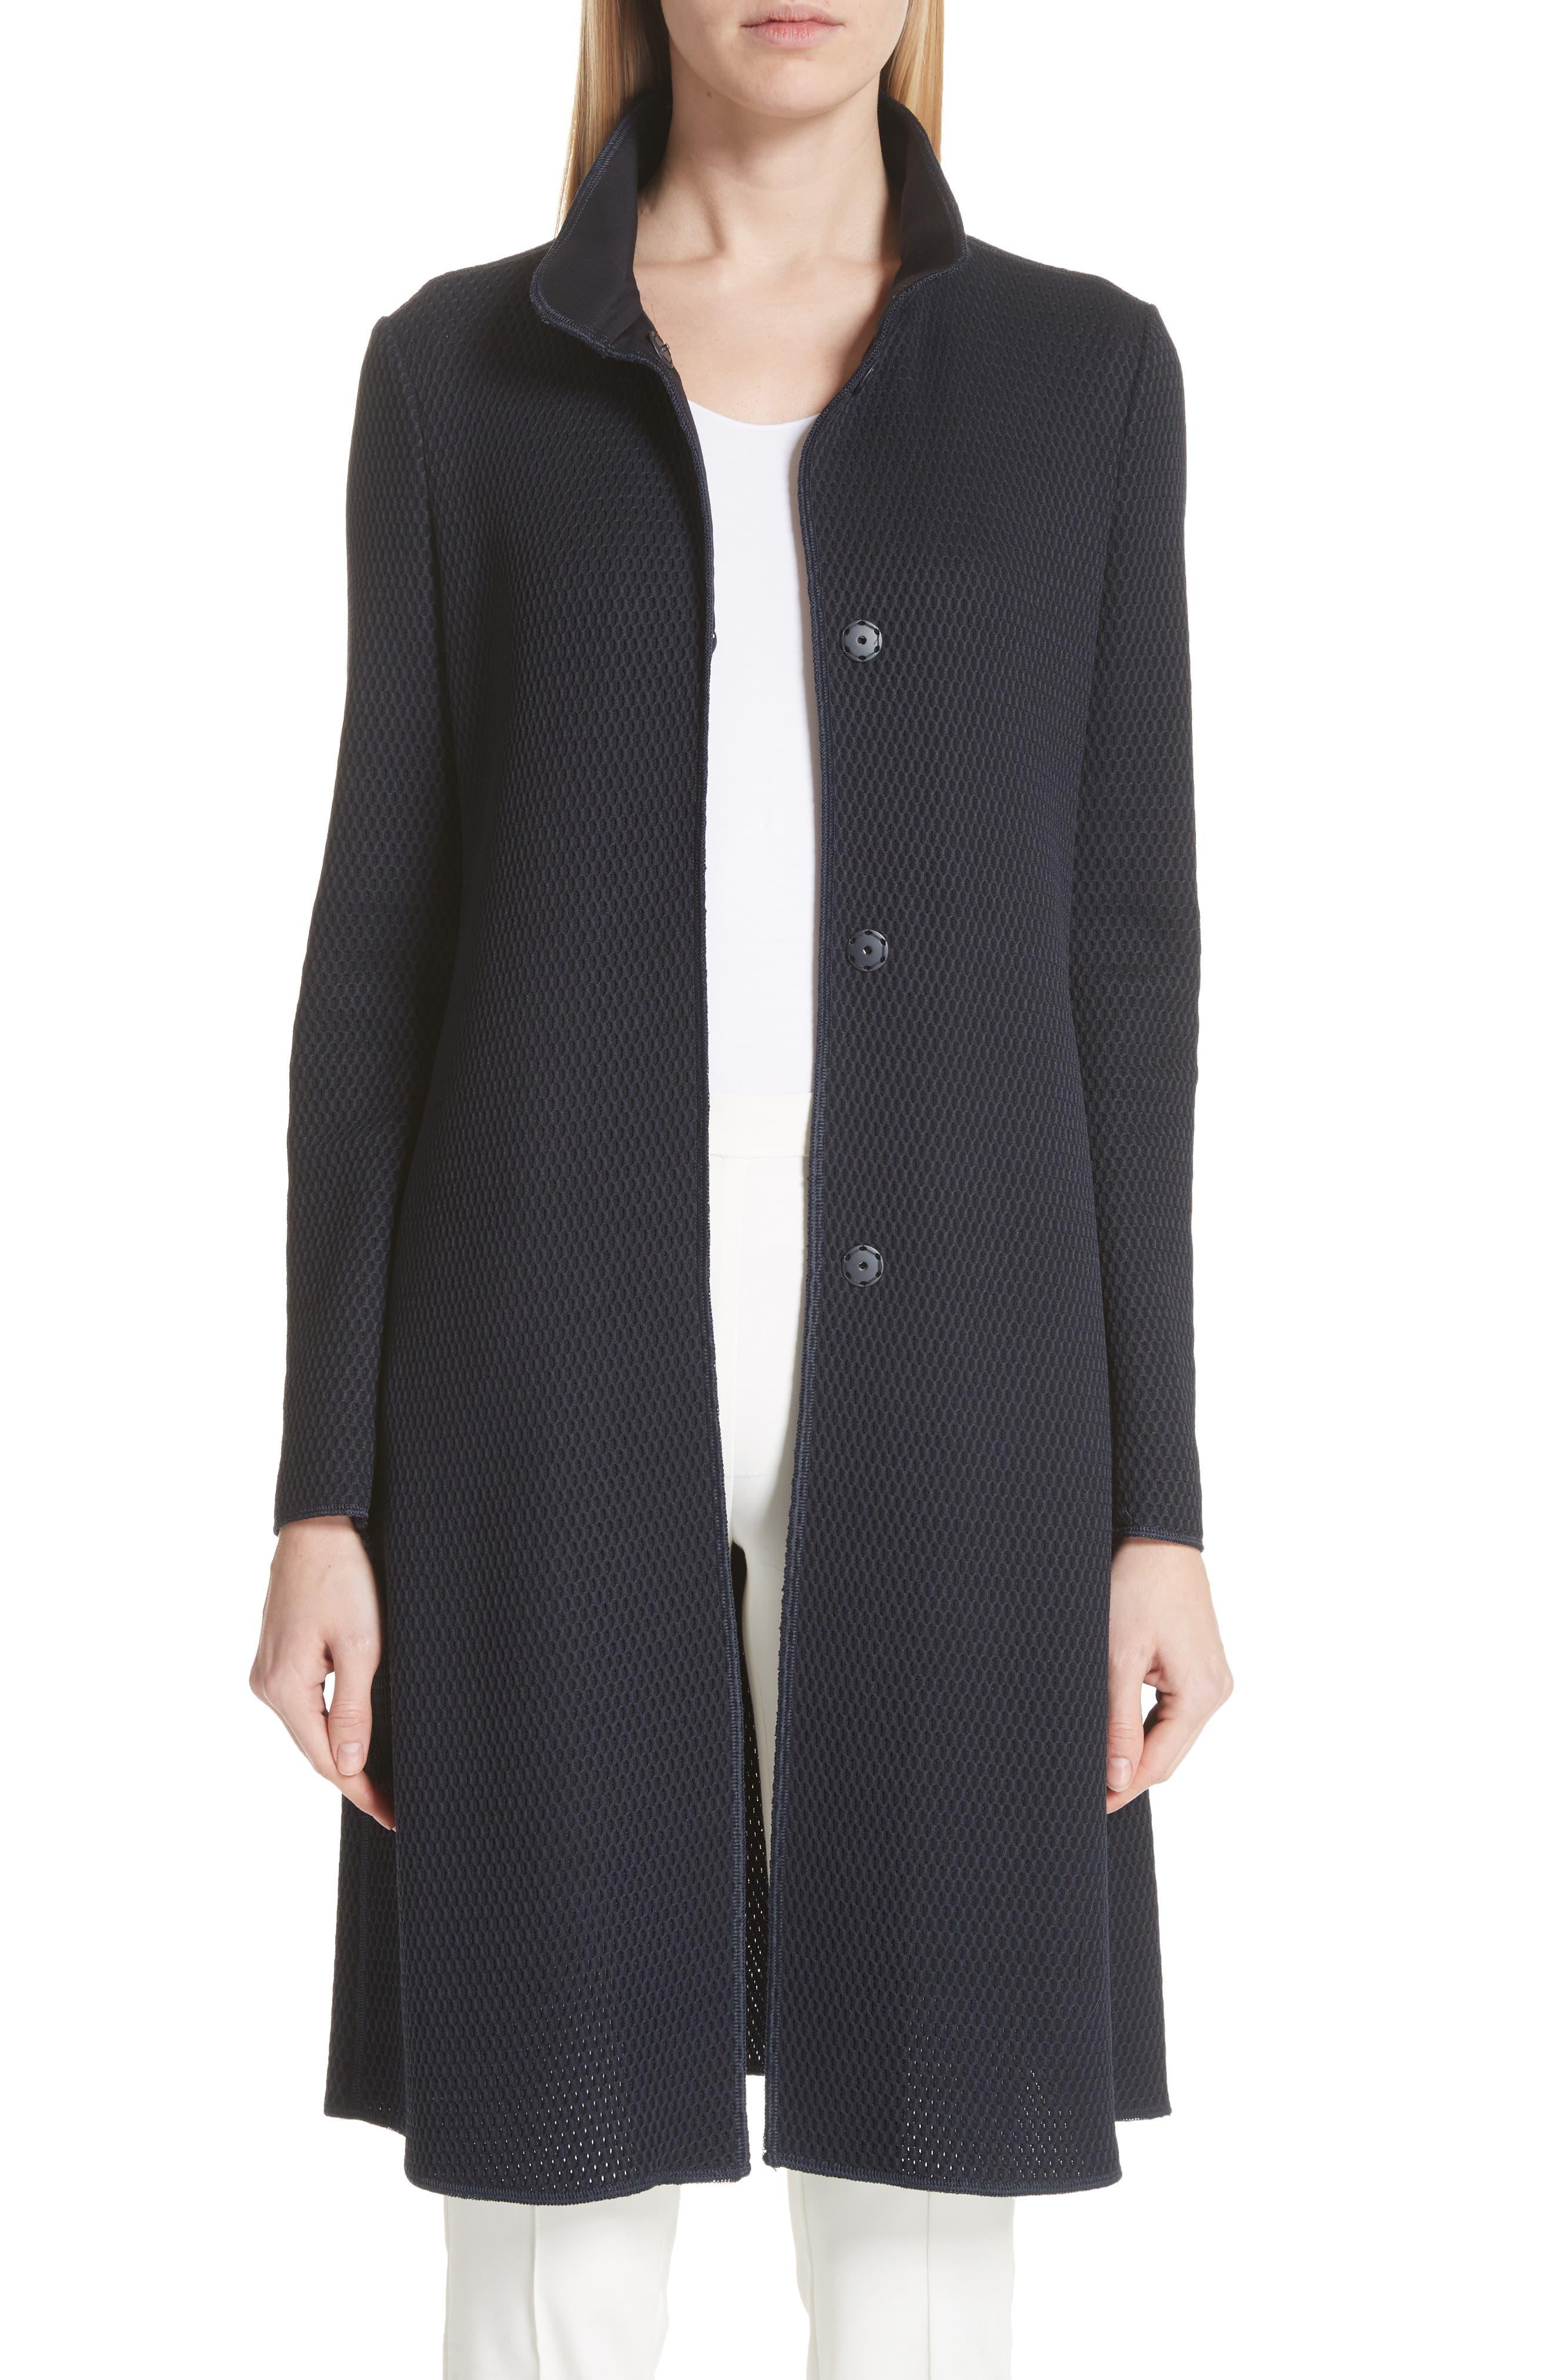 Honeycomb Knit Jersey Coat,                             Main thumbnail 1, color,                             414